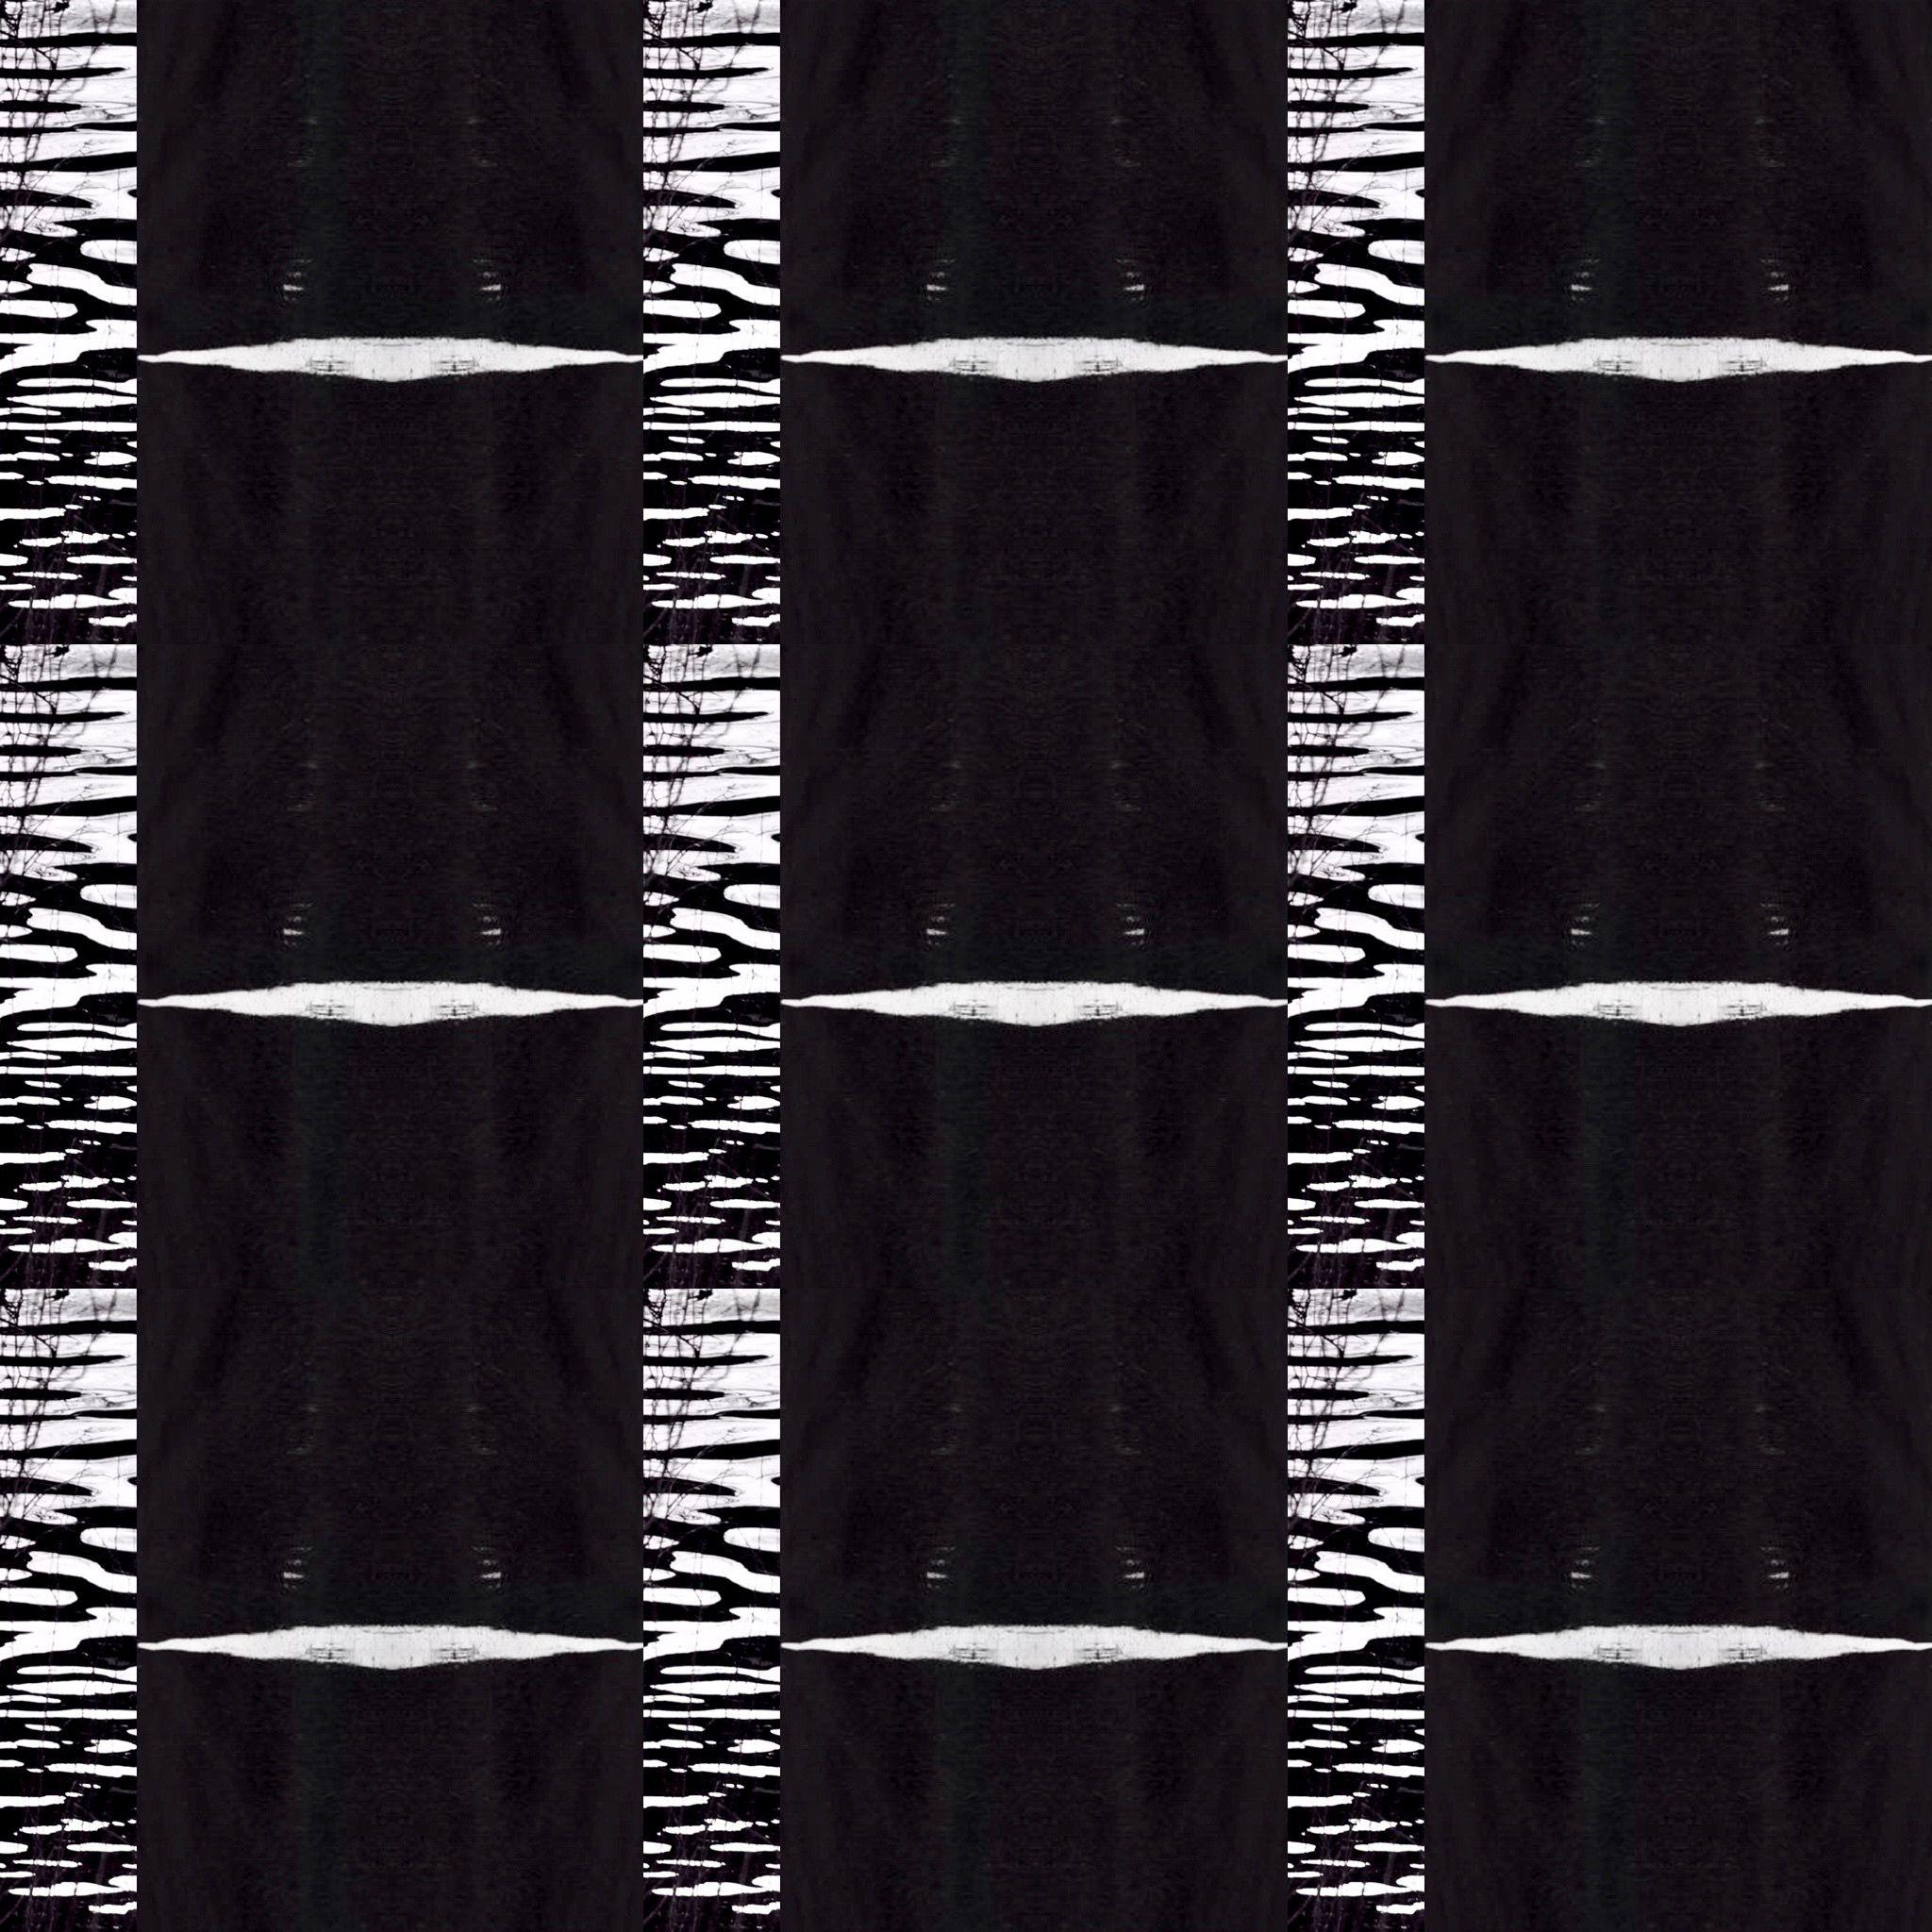 Vlakverdeling Fotokunst 30x30 cm Inkjet Jackie Van Duin